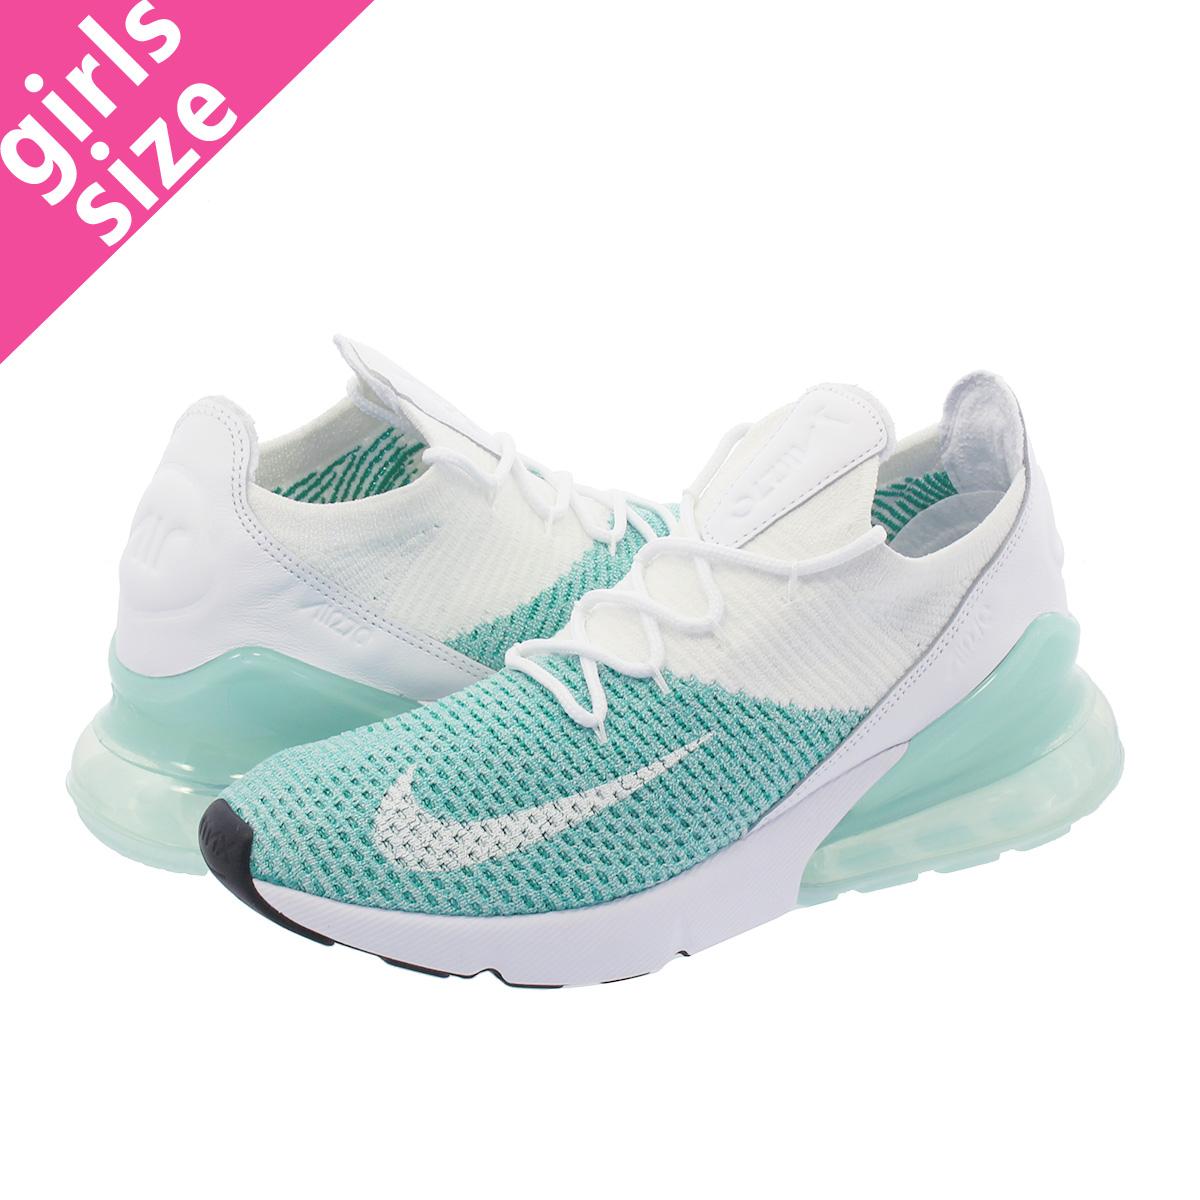 cheap for discount 45300 0e420 NIKE WMNS AIR MAX 270 FLYKNIT Nike women Air Max 270 fried food knit IGLOO  WHITE/CLEAR EMERLAD/BLACK ah6803-301